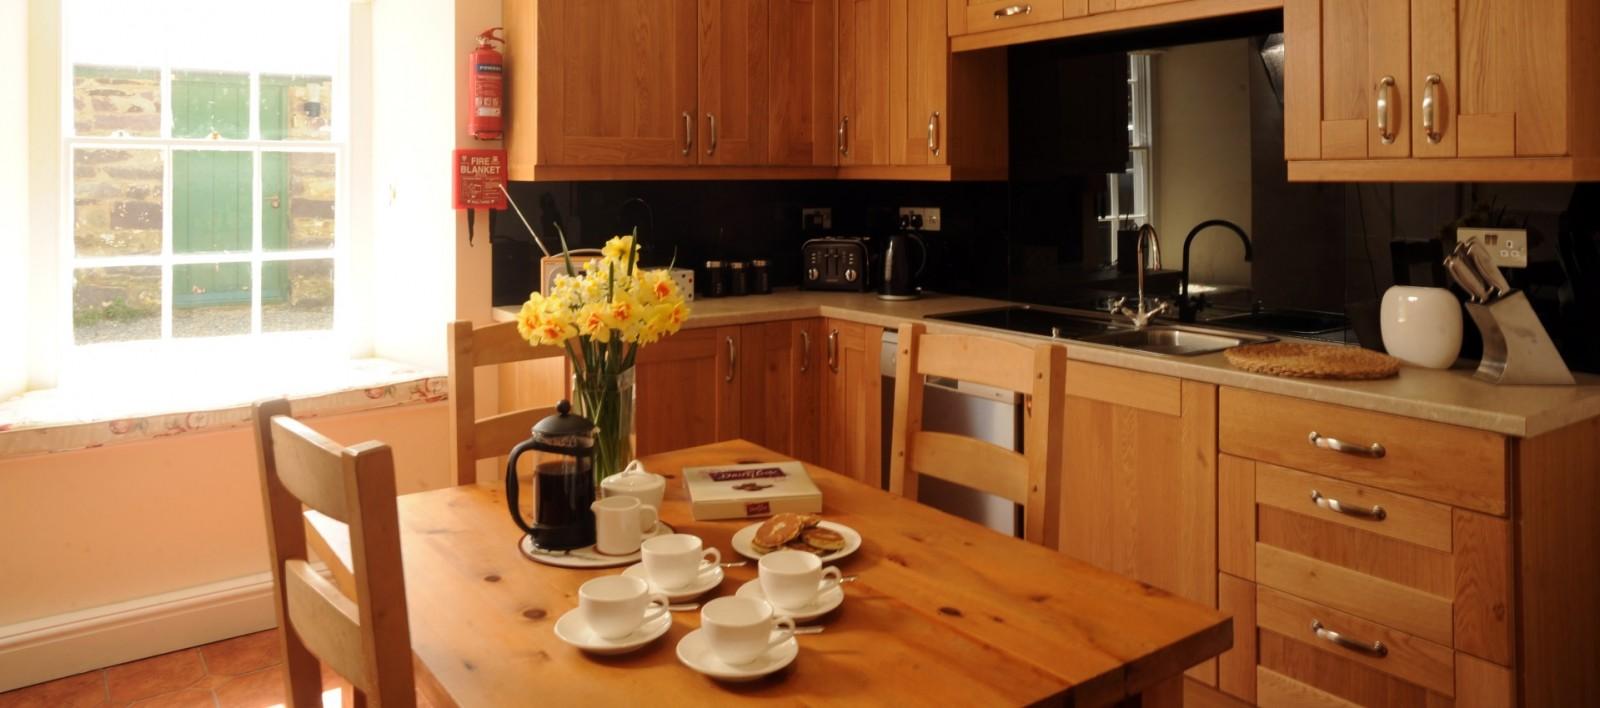 Holiday Cottage Pembrokeshire Big Kitchen